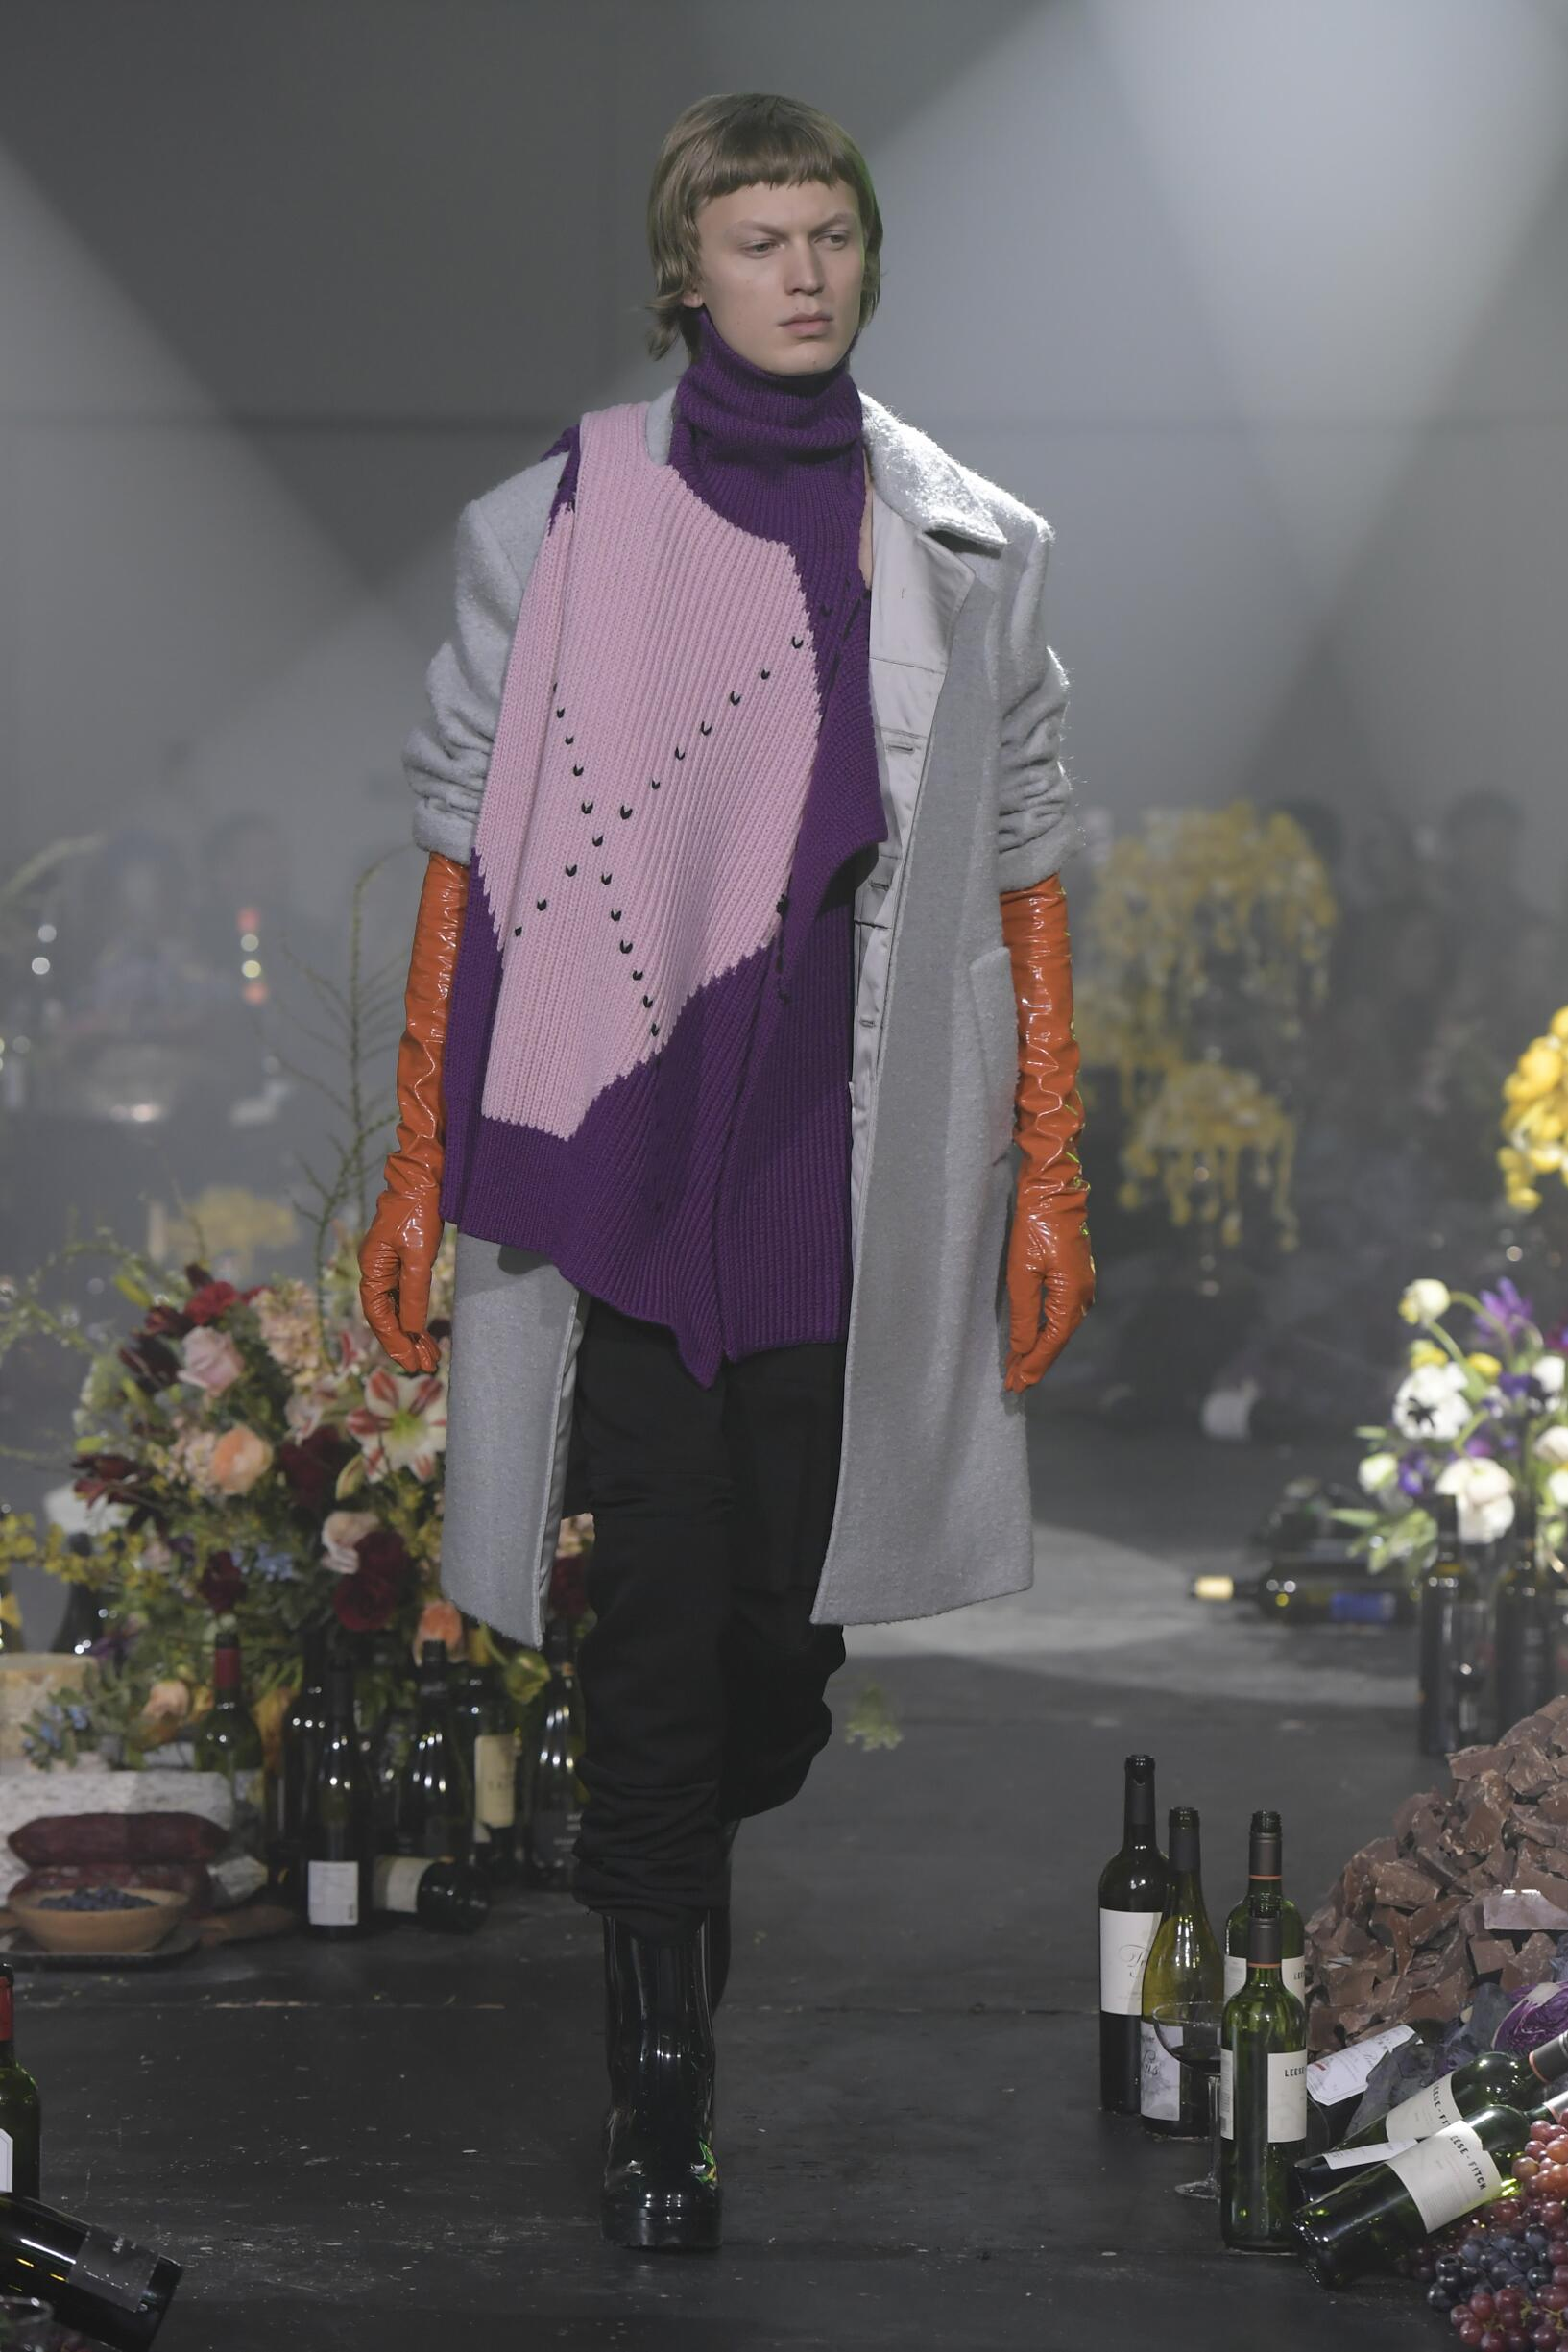 Man FW 2018-19 Fashion Show Raf Simons